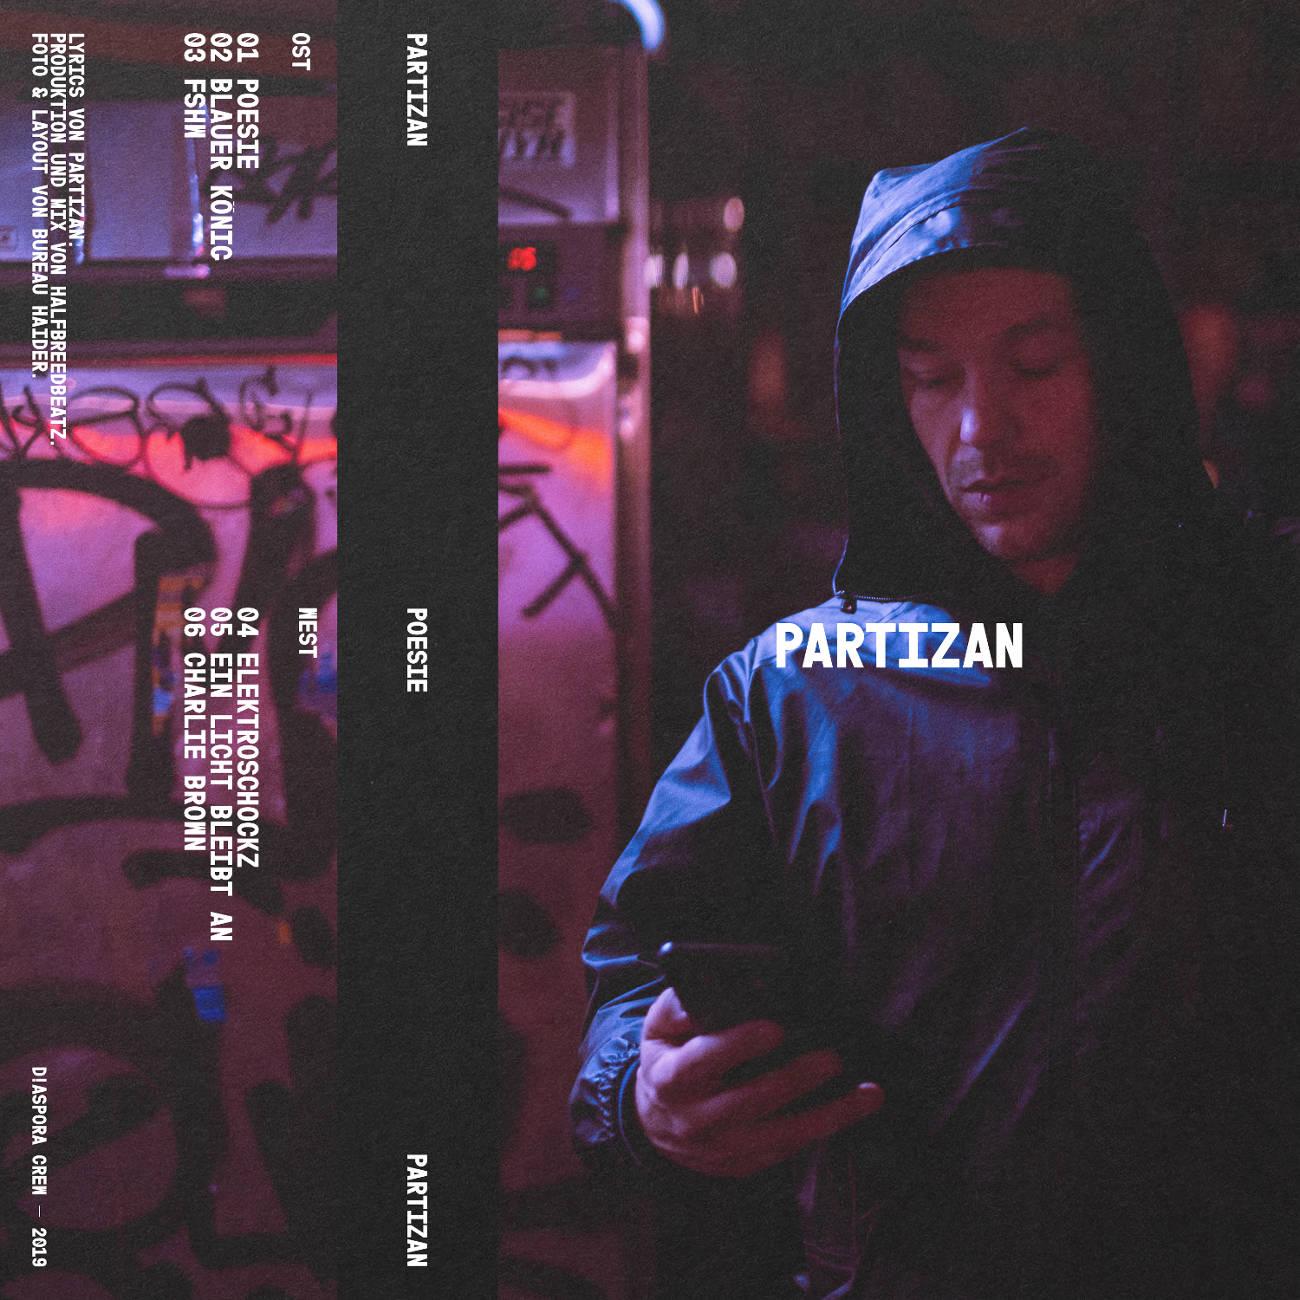 Upcoming: Partizan - Poesie